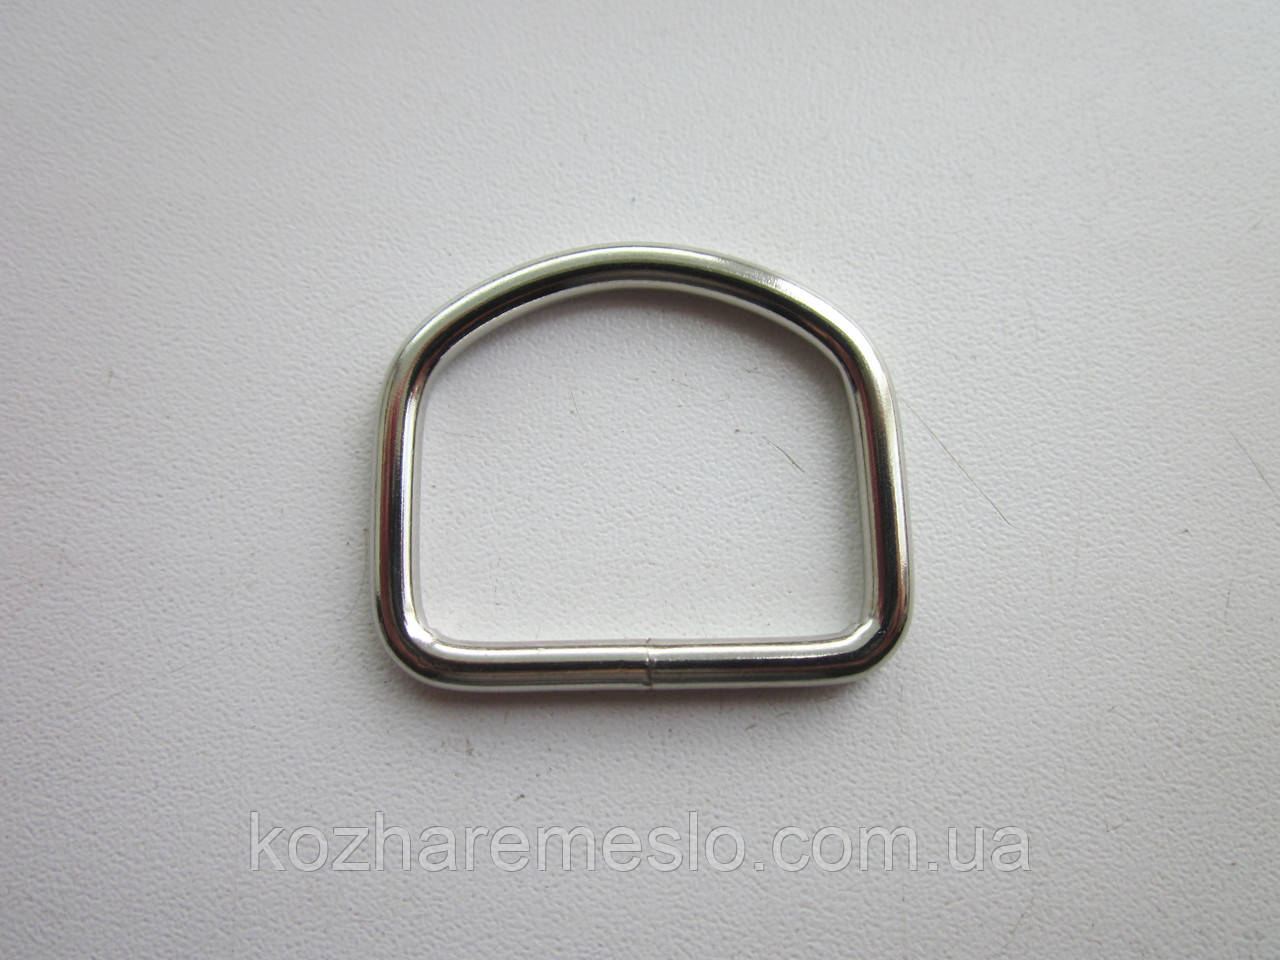 Полукольцо 3,5 х 25  х 24 мм никель